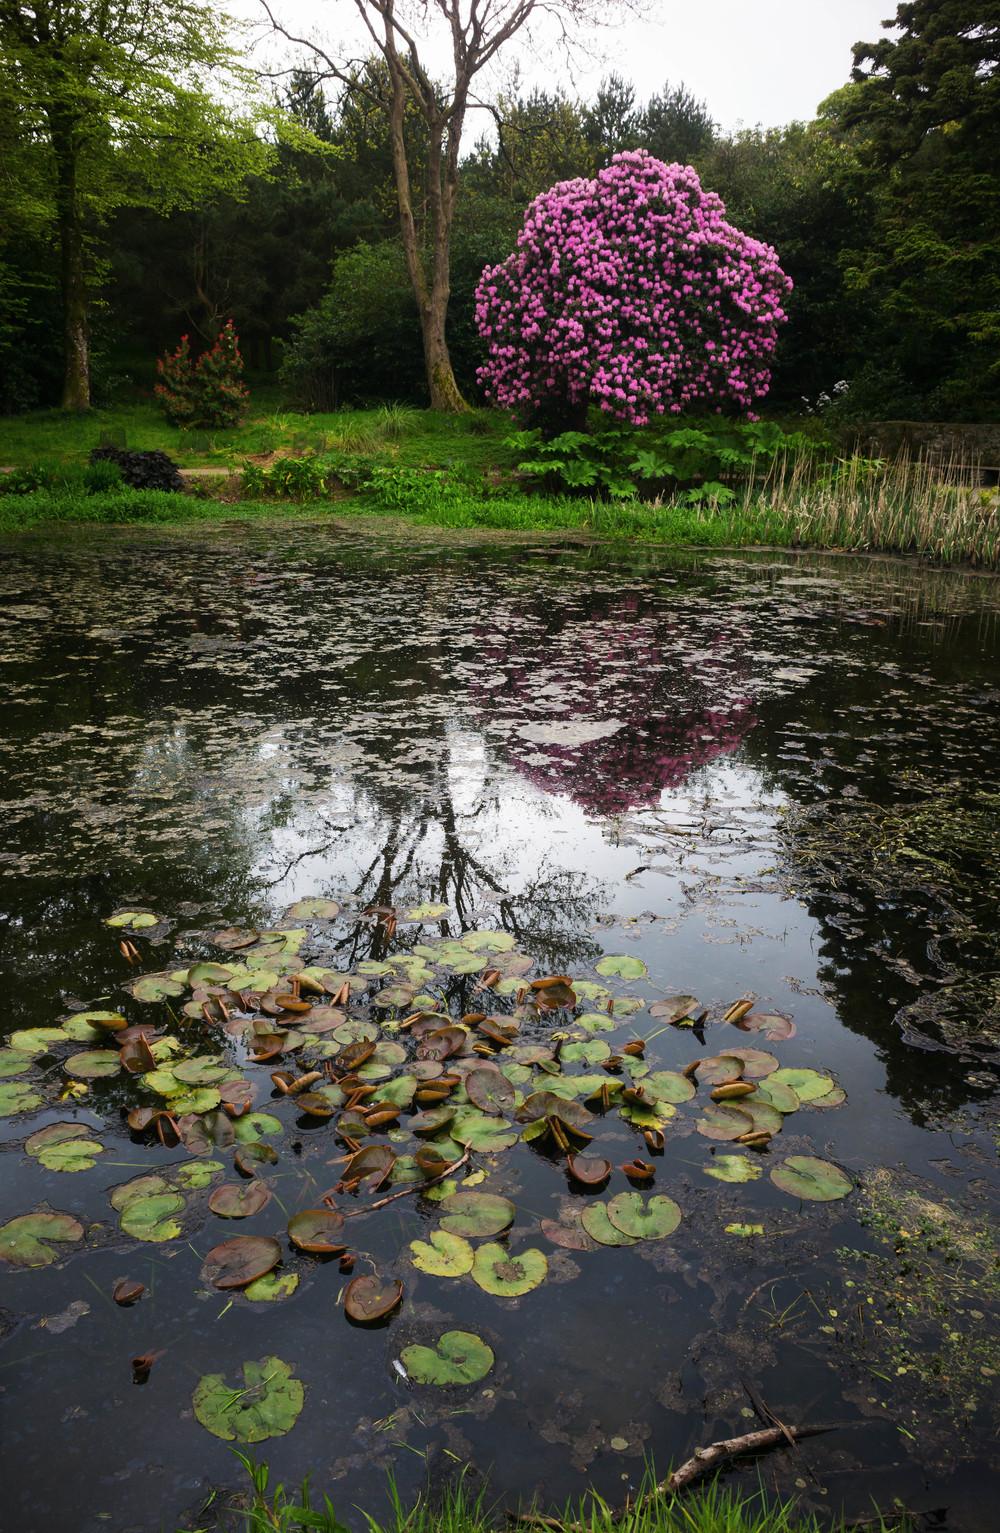 Kilmacurragh Arboretum, May 2016